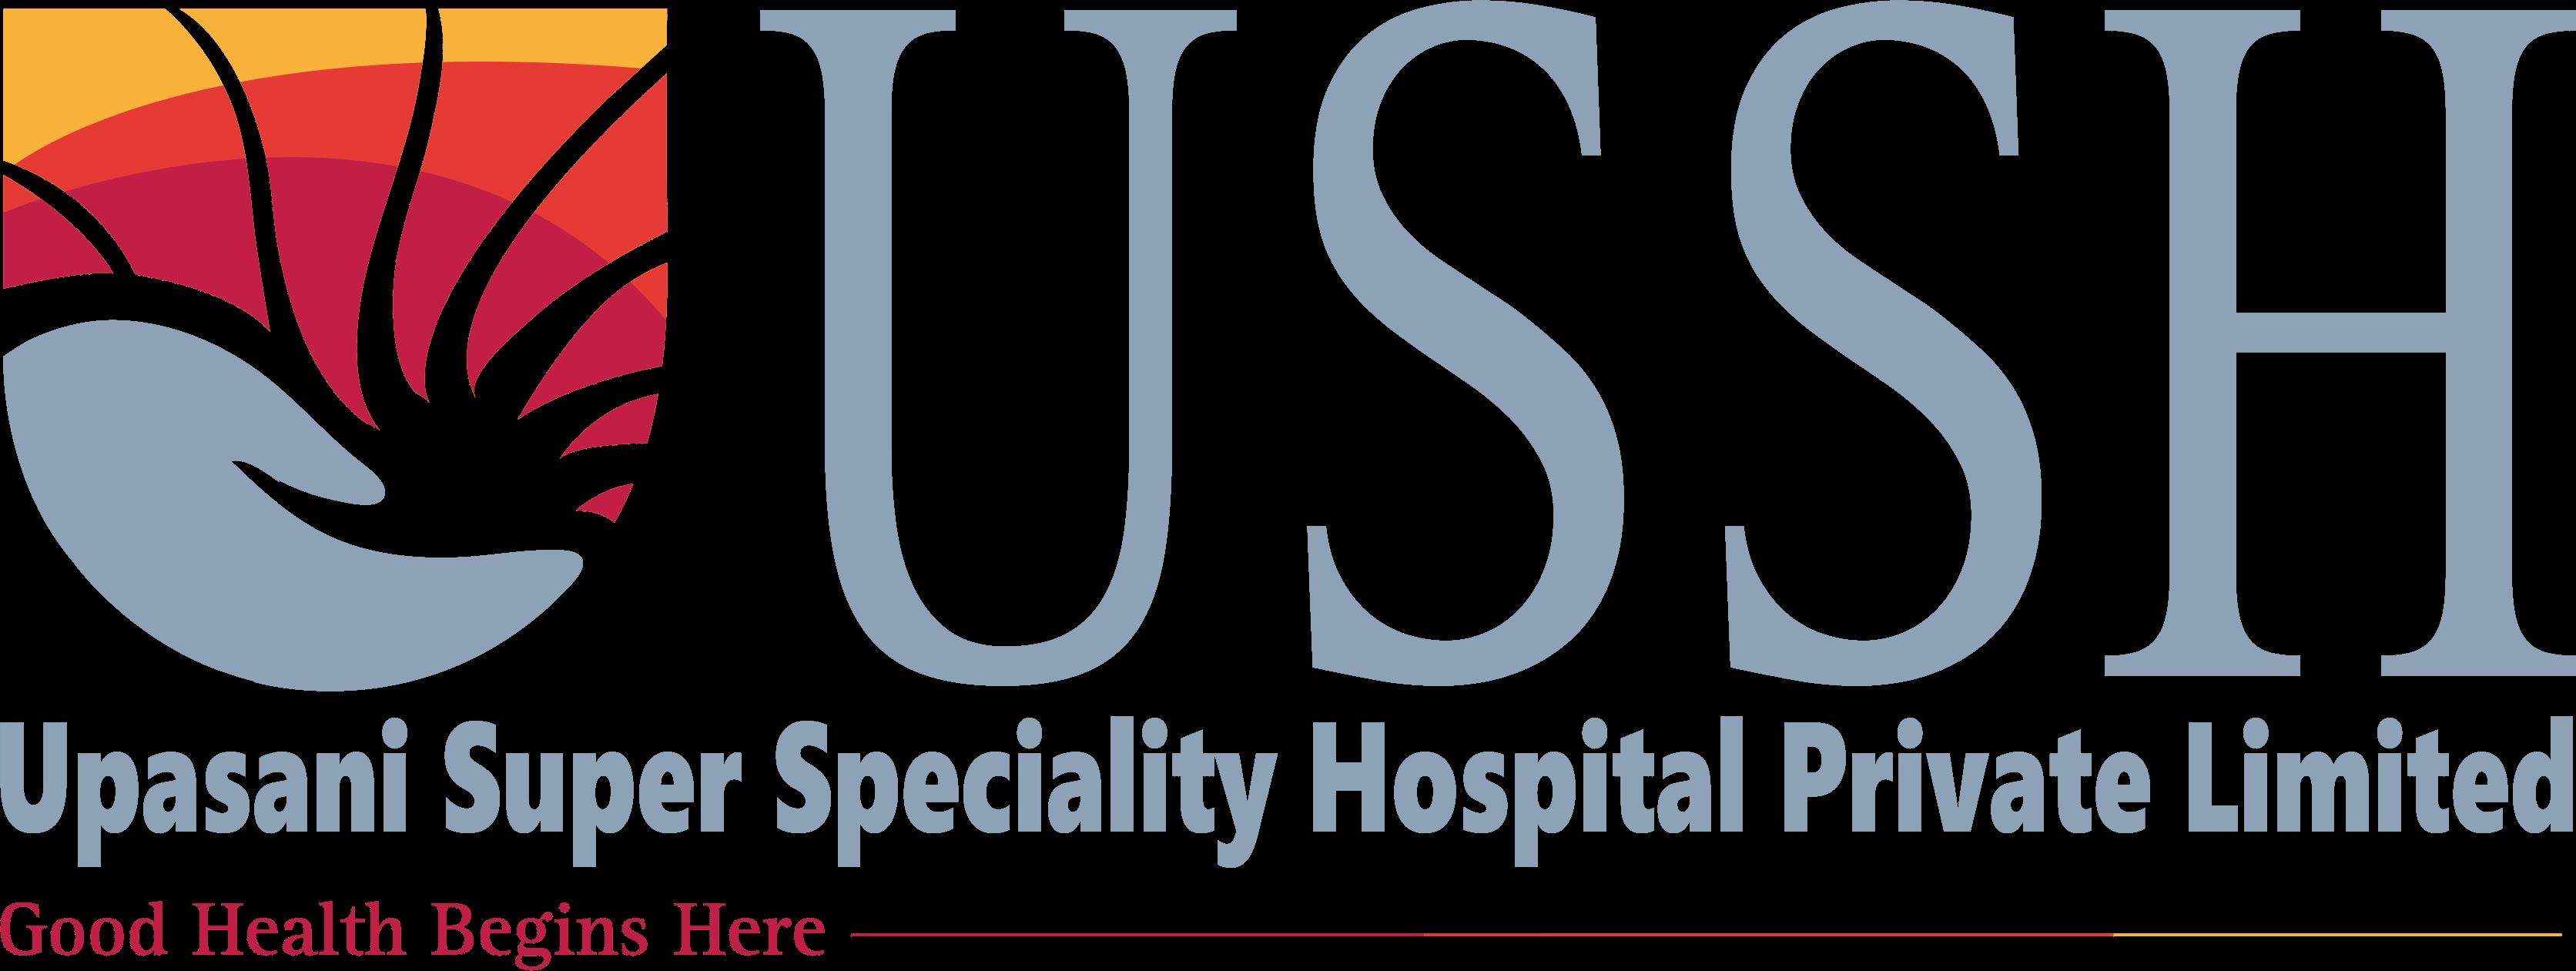 Best Super Speciality Hospital in Mulund, Mumbai